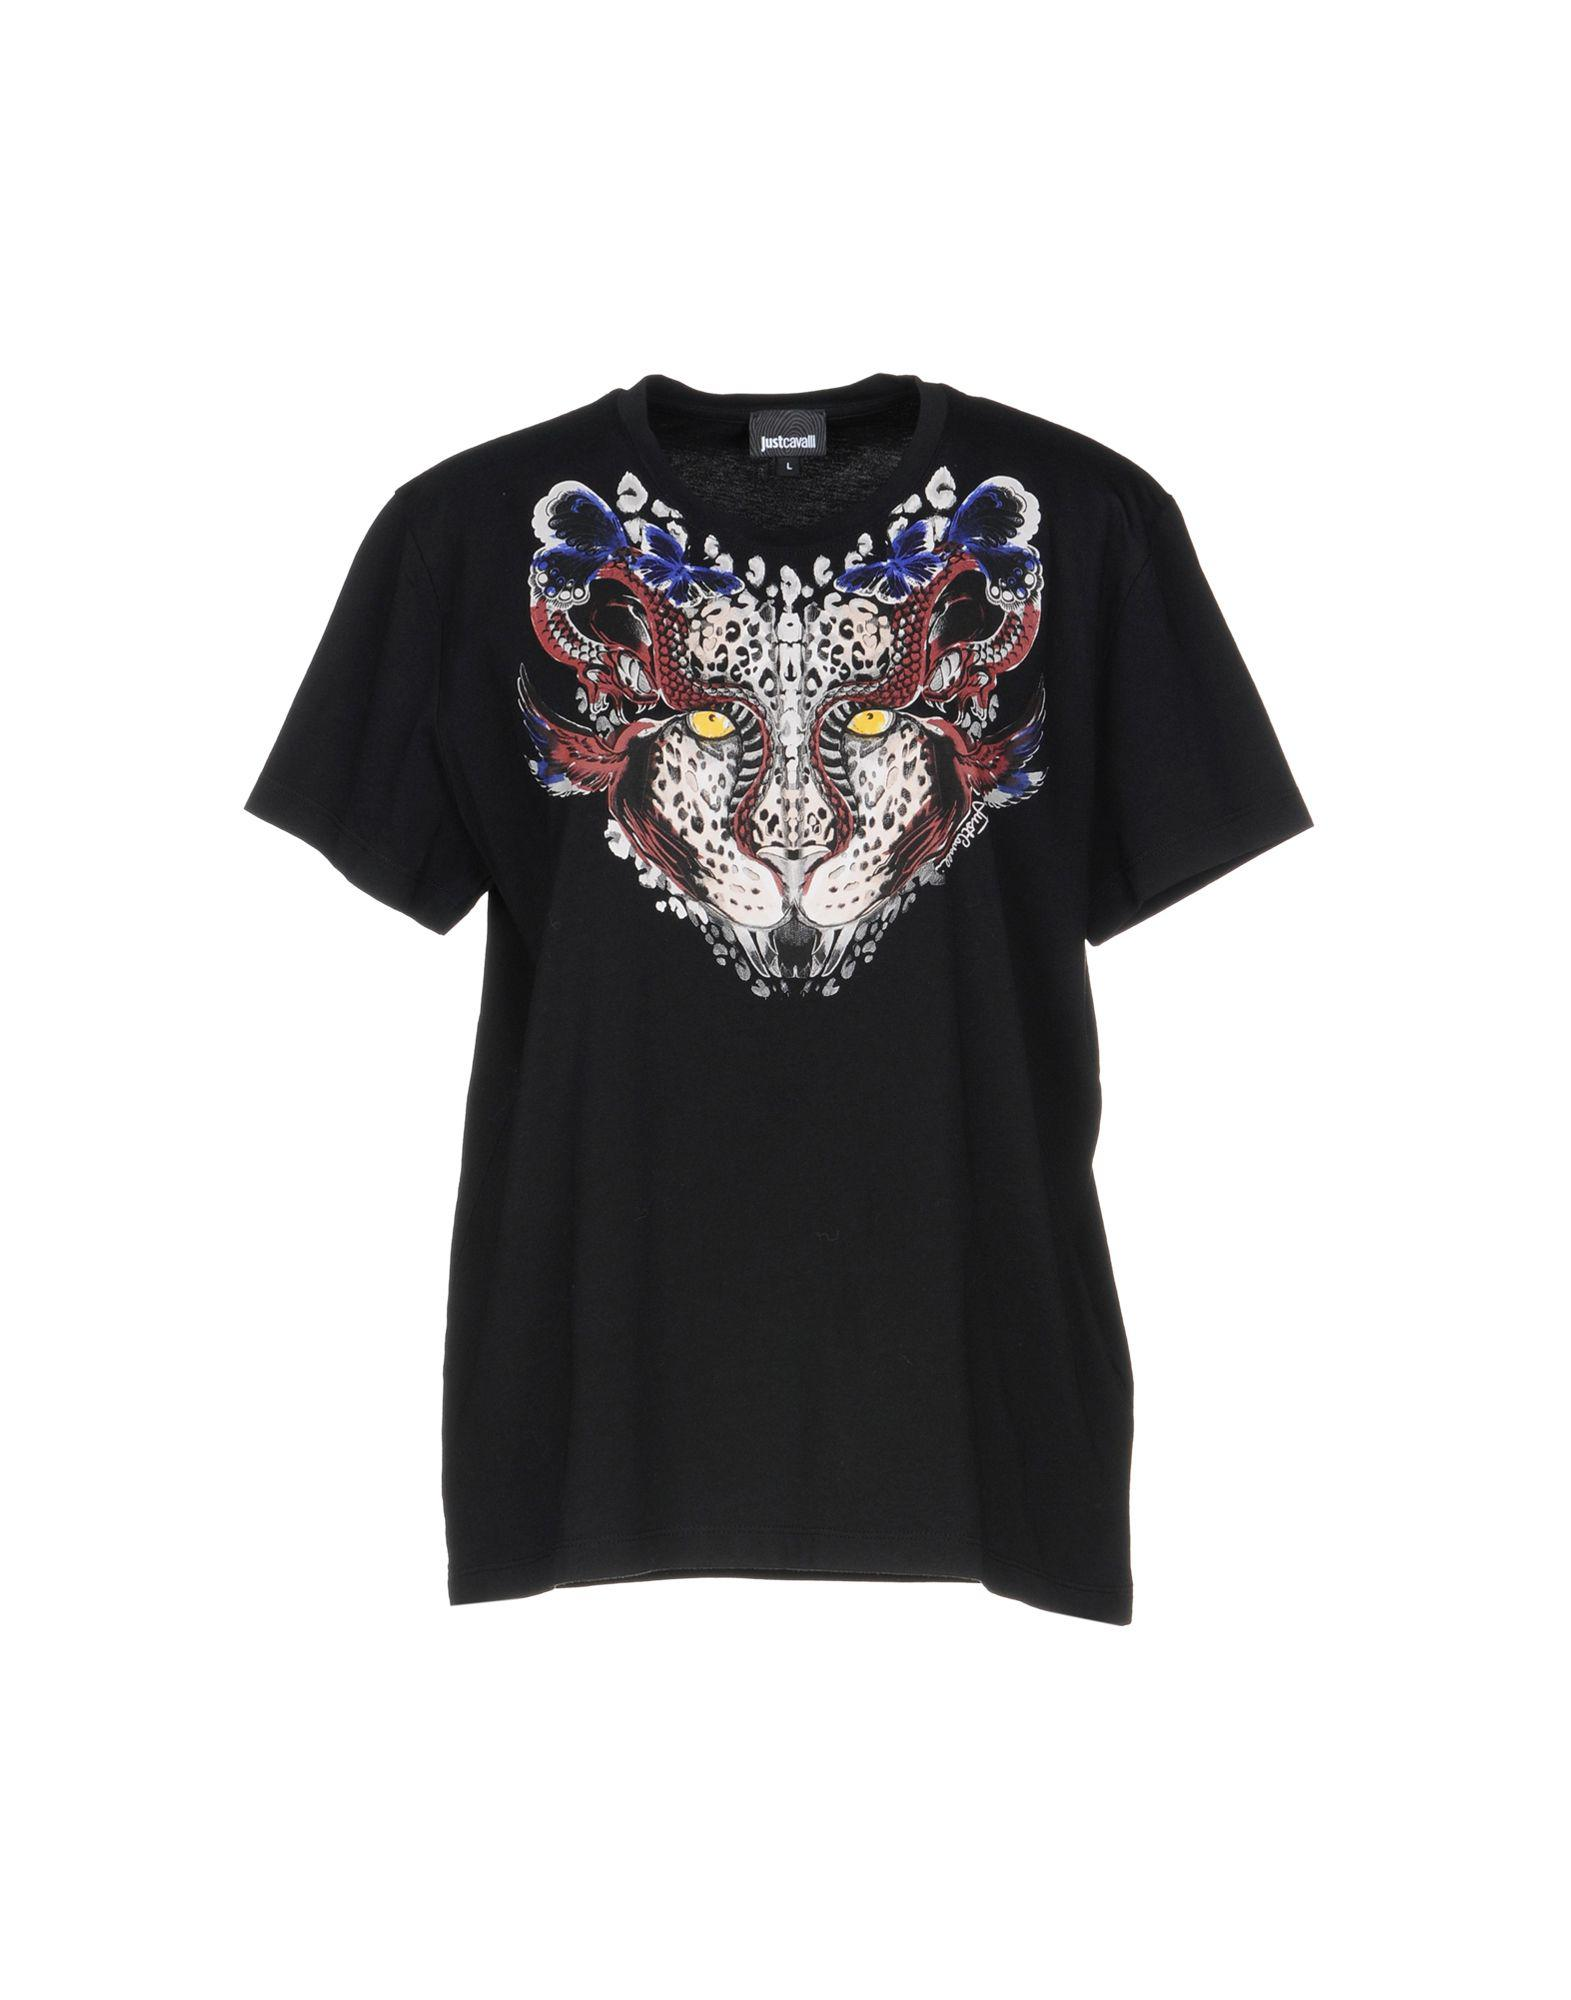 96406d6e0 Lyst - Just Cavalli T-shirt in Black for Men